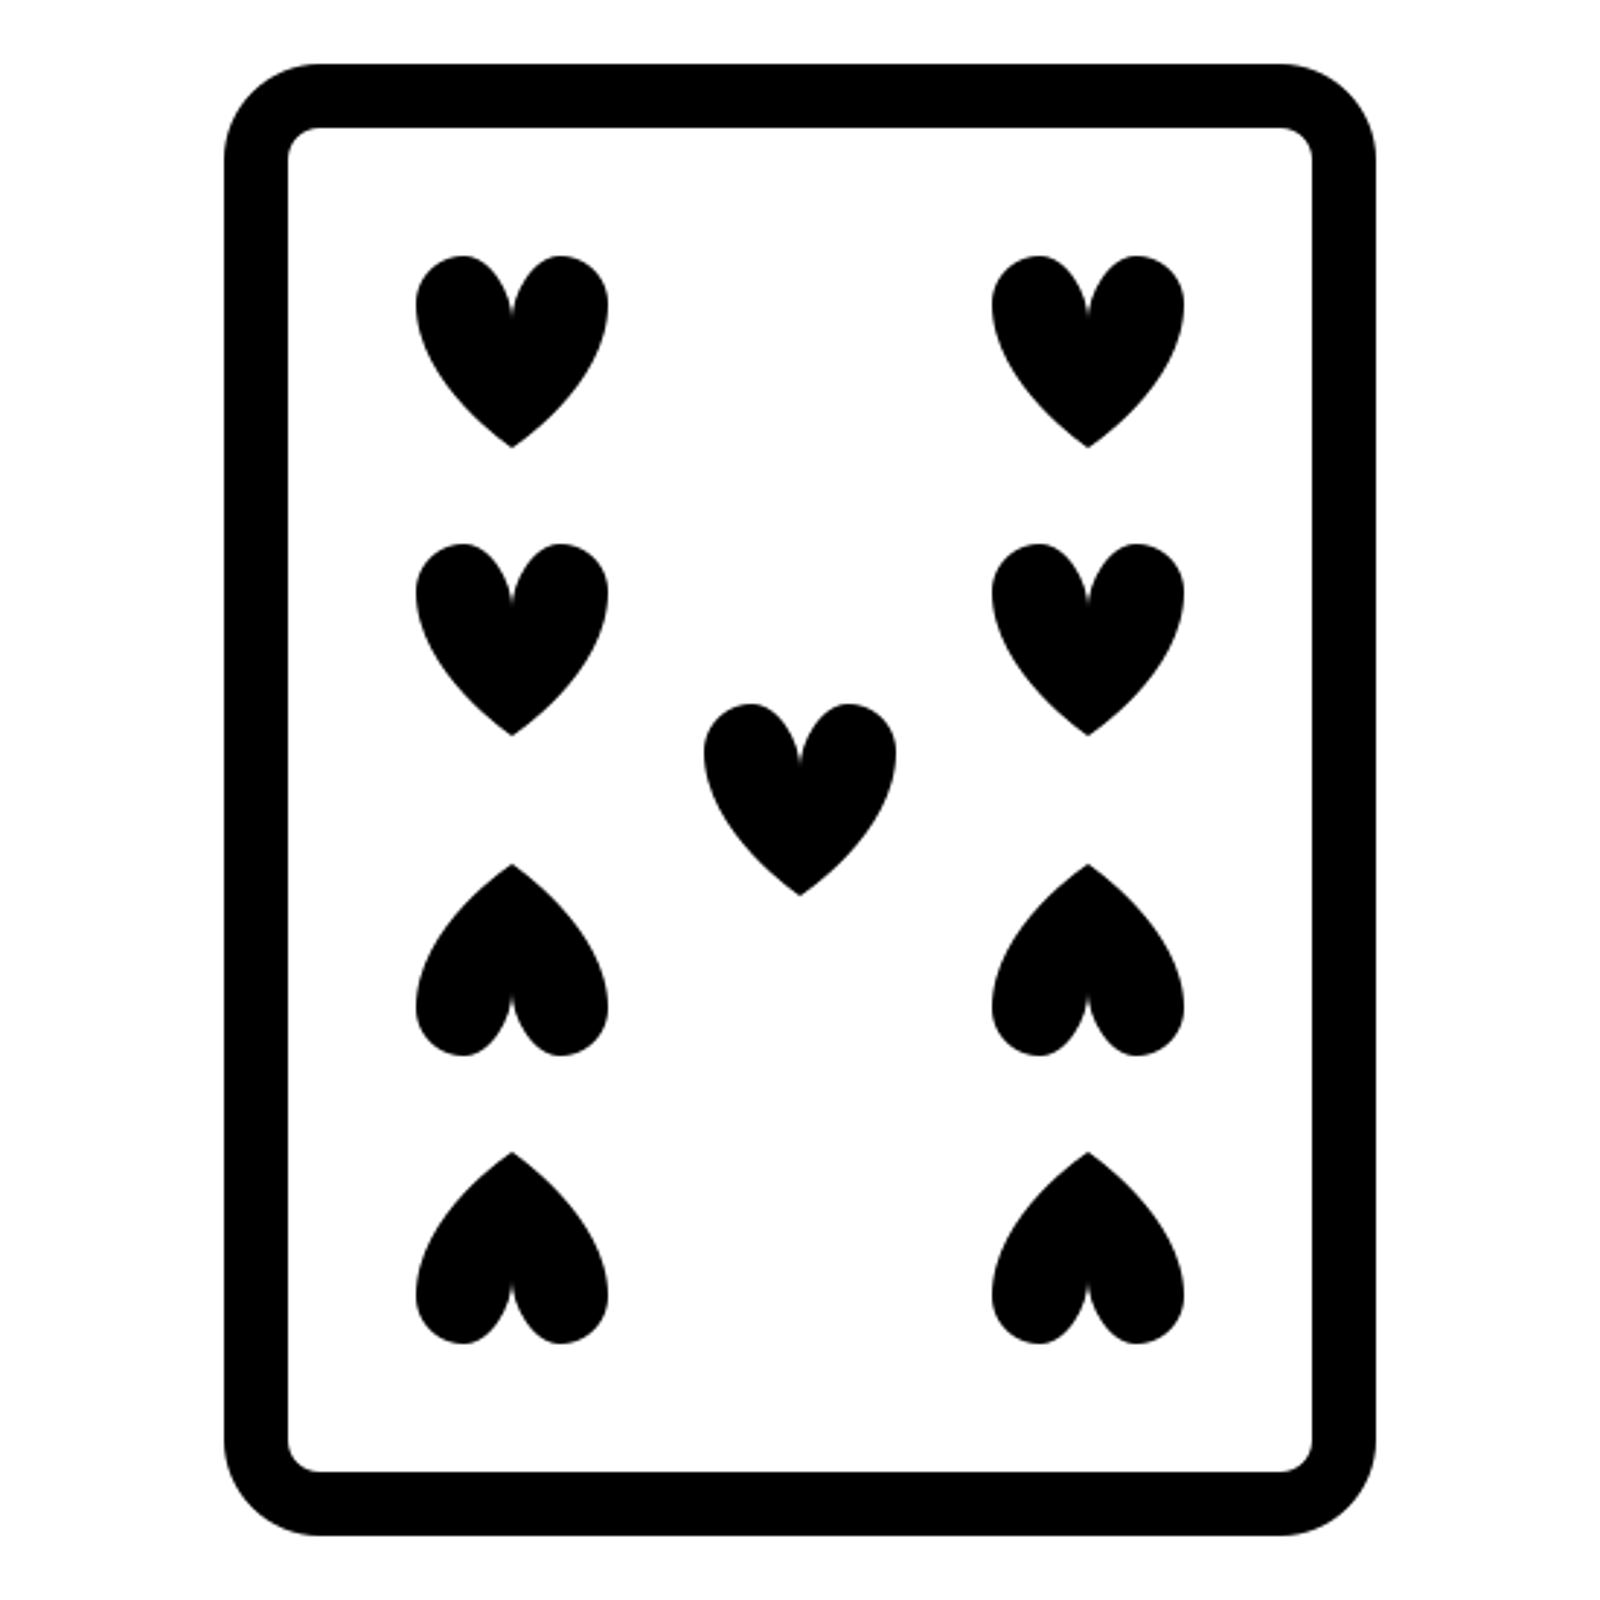 9 of Hearts icon